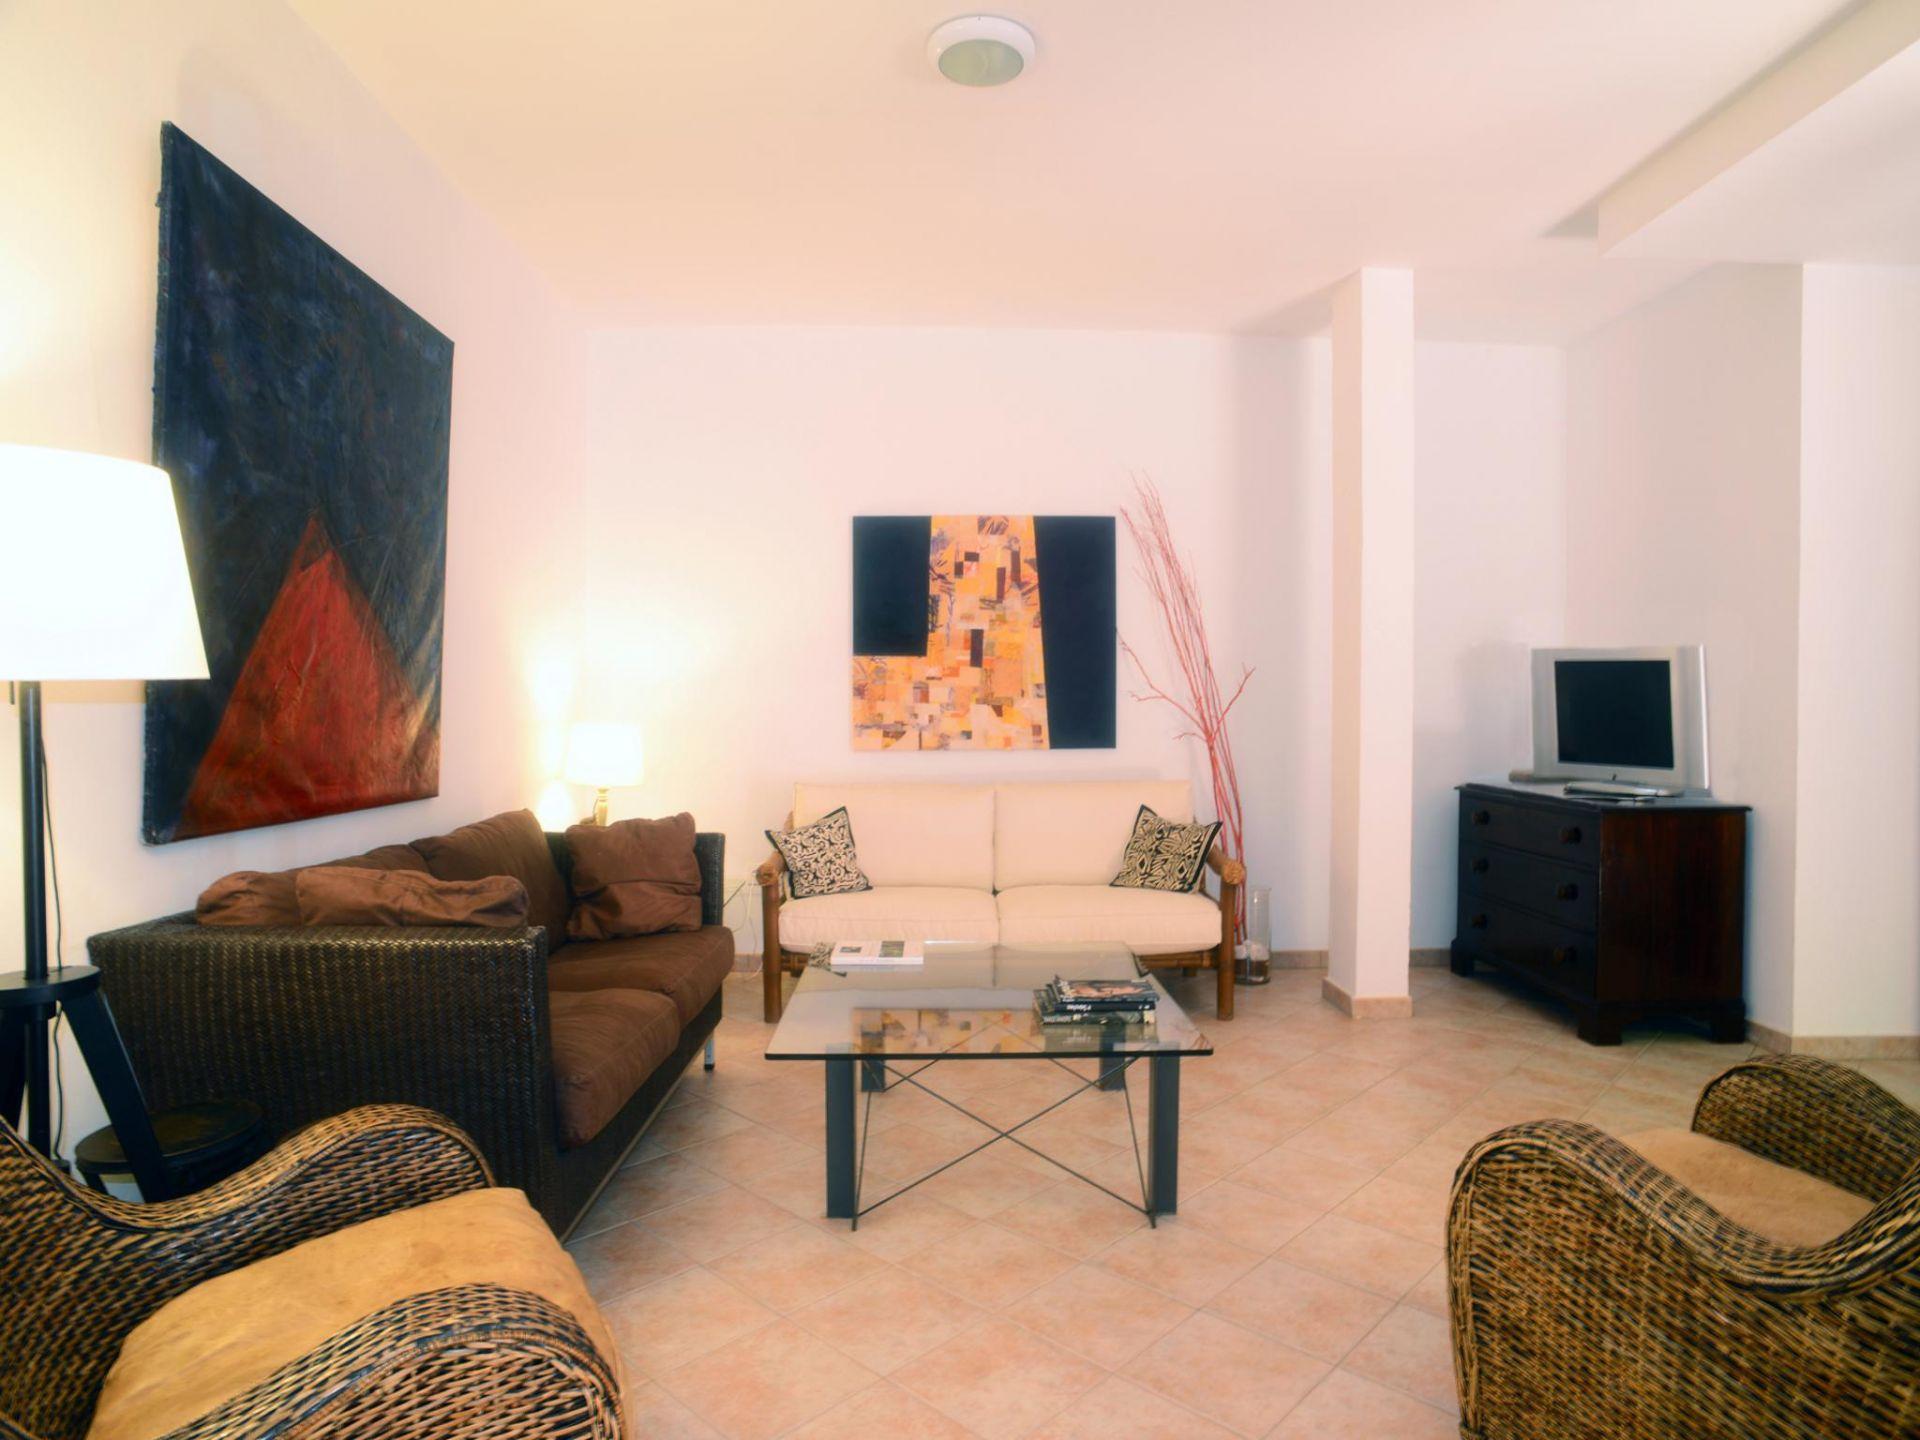 Holiday apartment Villa San Agustin 10 - Holiday Rental (854295), Maspalomas, Gran Canaria, Canary Islands, Spain, picture 29